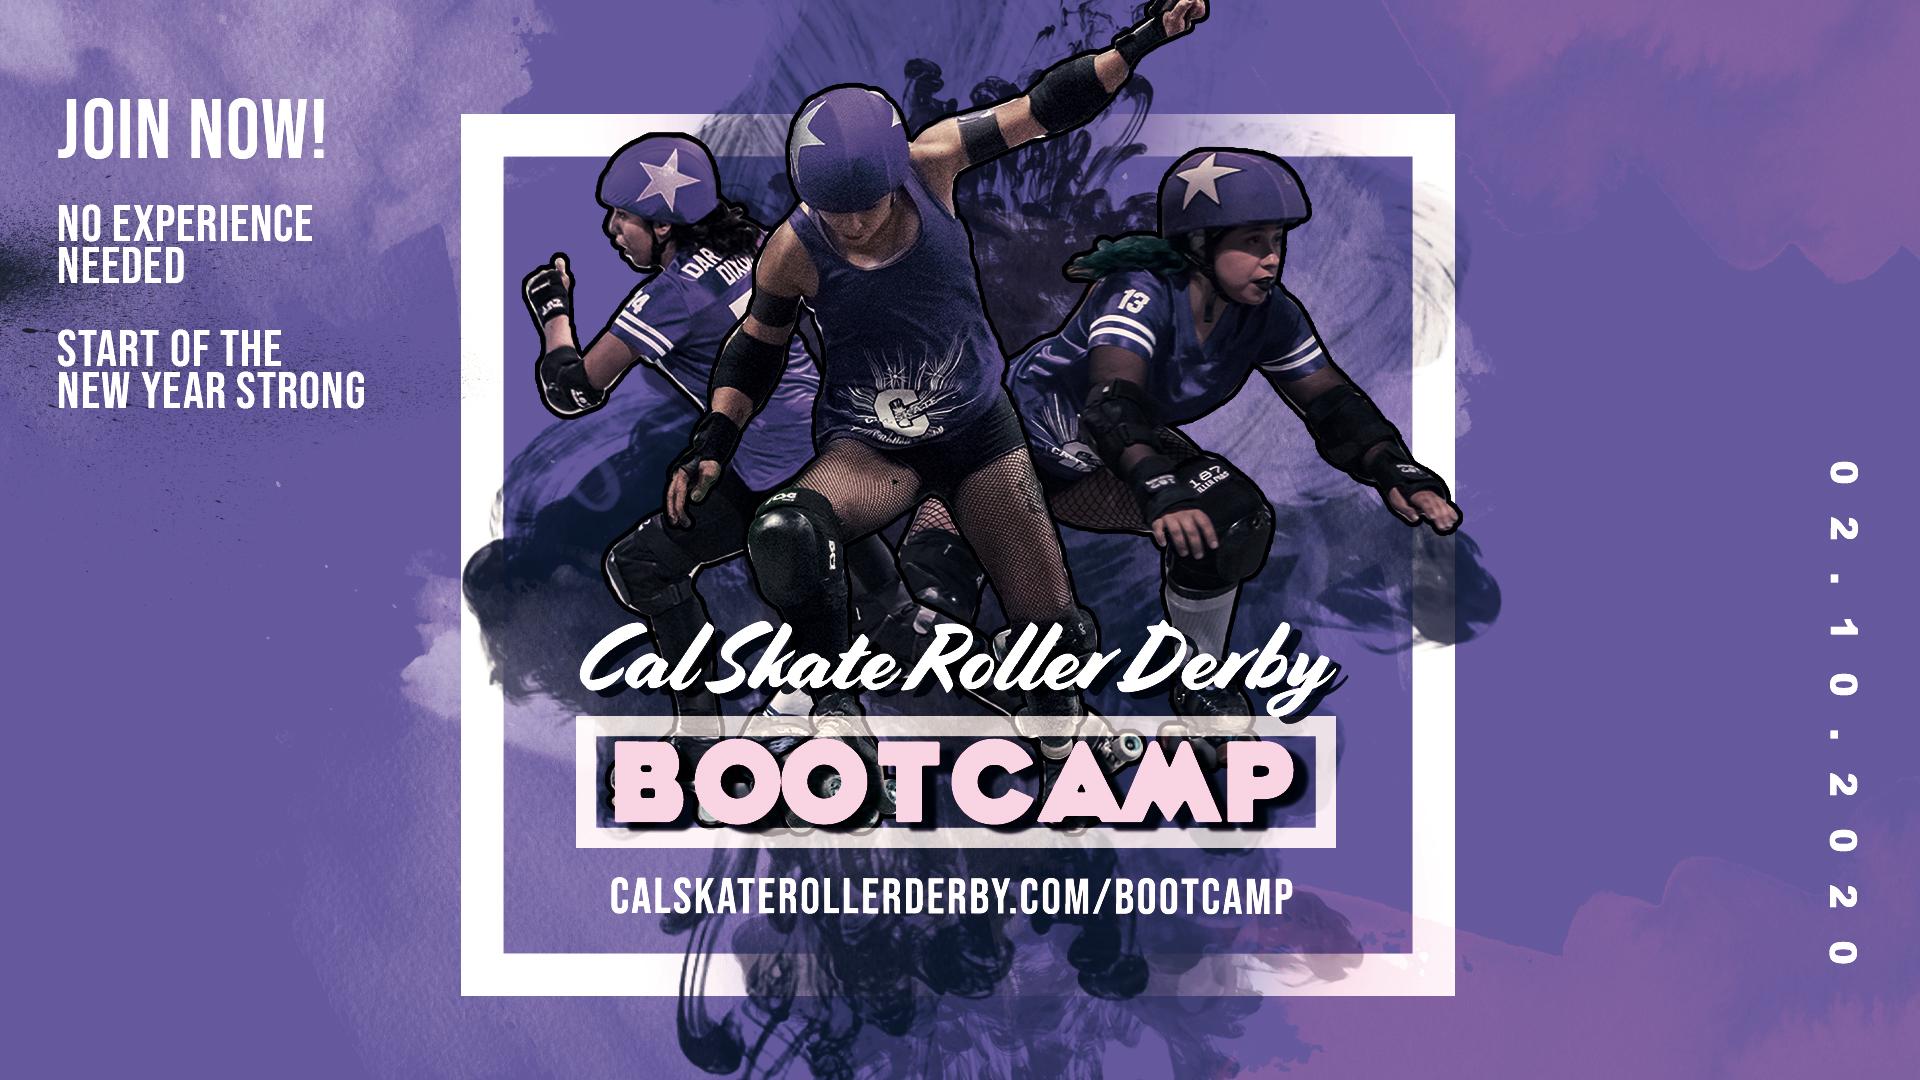 Cal Skate Roller Derby